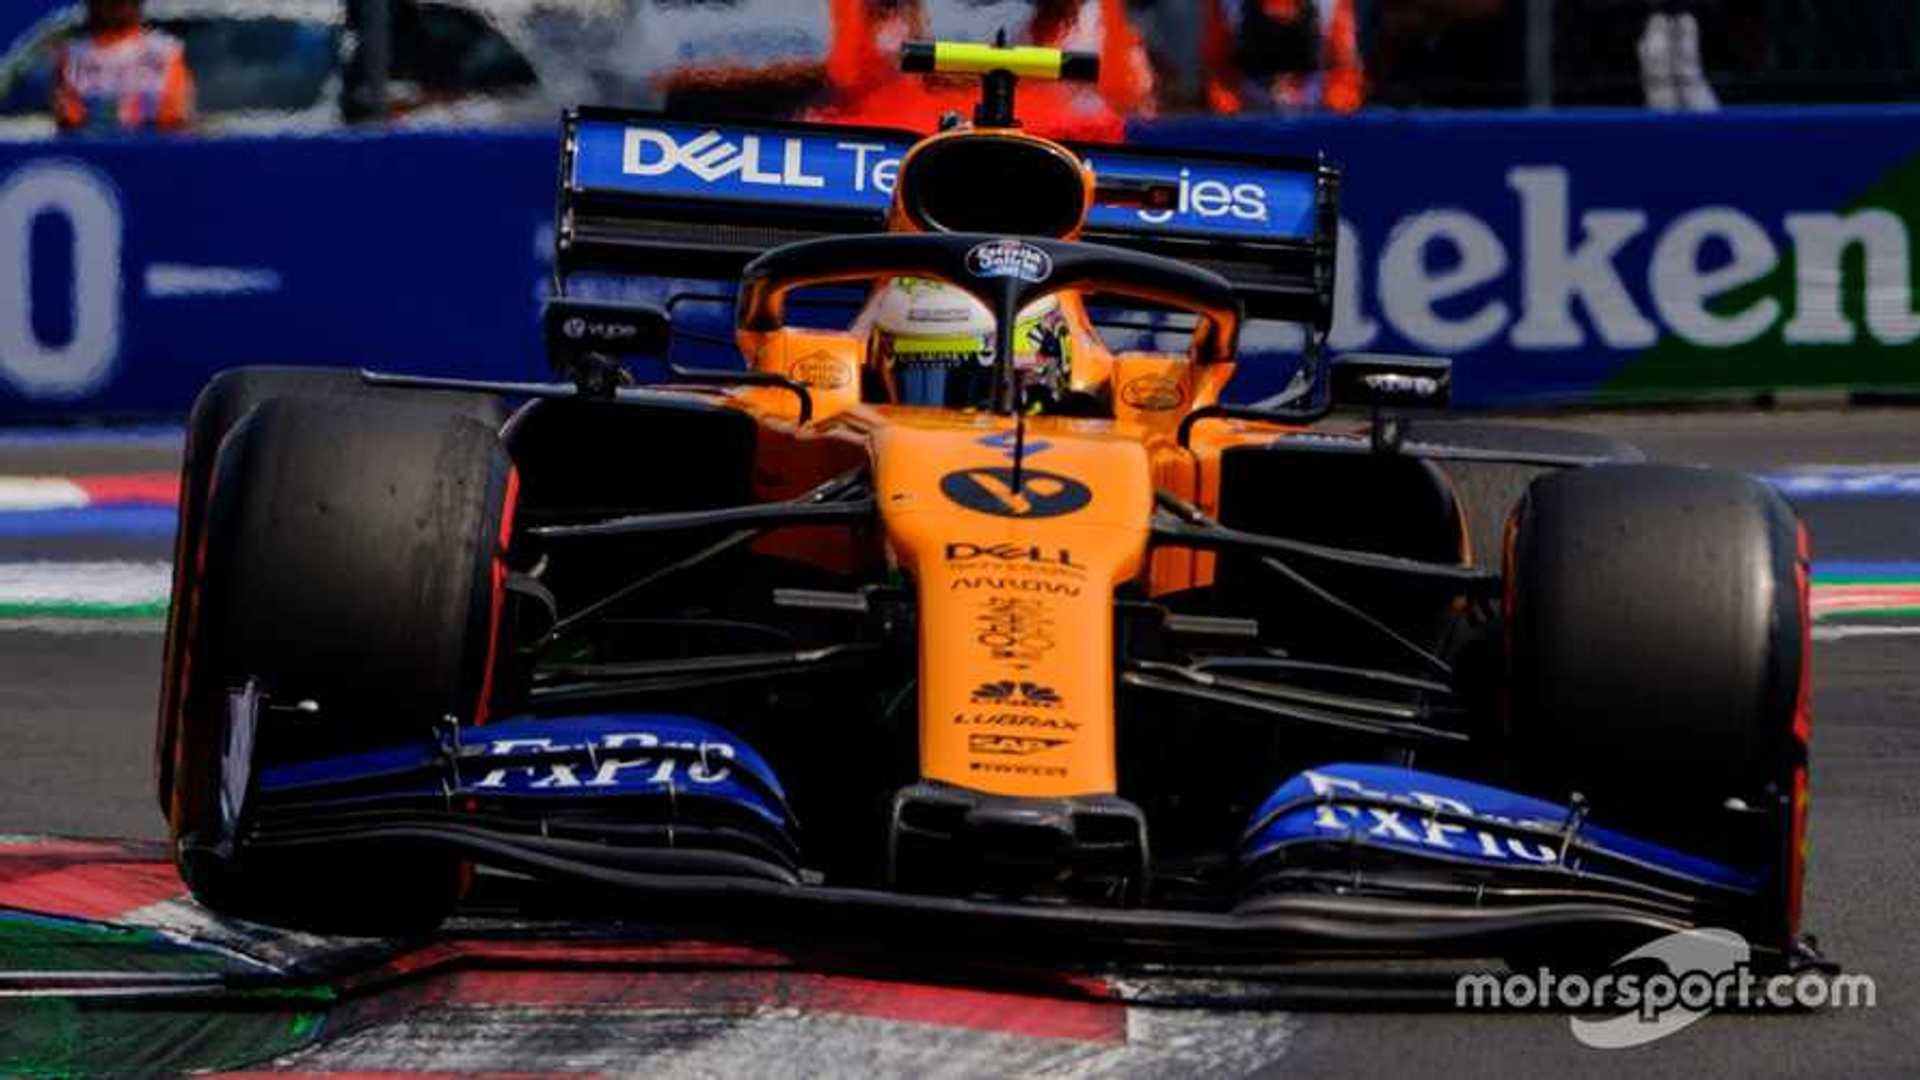 McLaren not expecting 2019-style 'huge step' in 2020